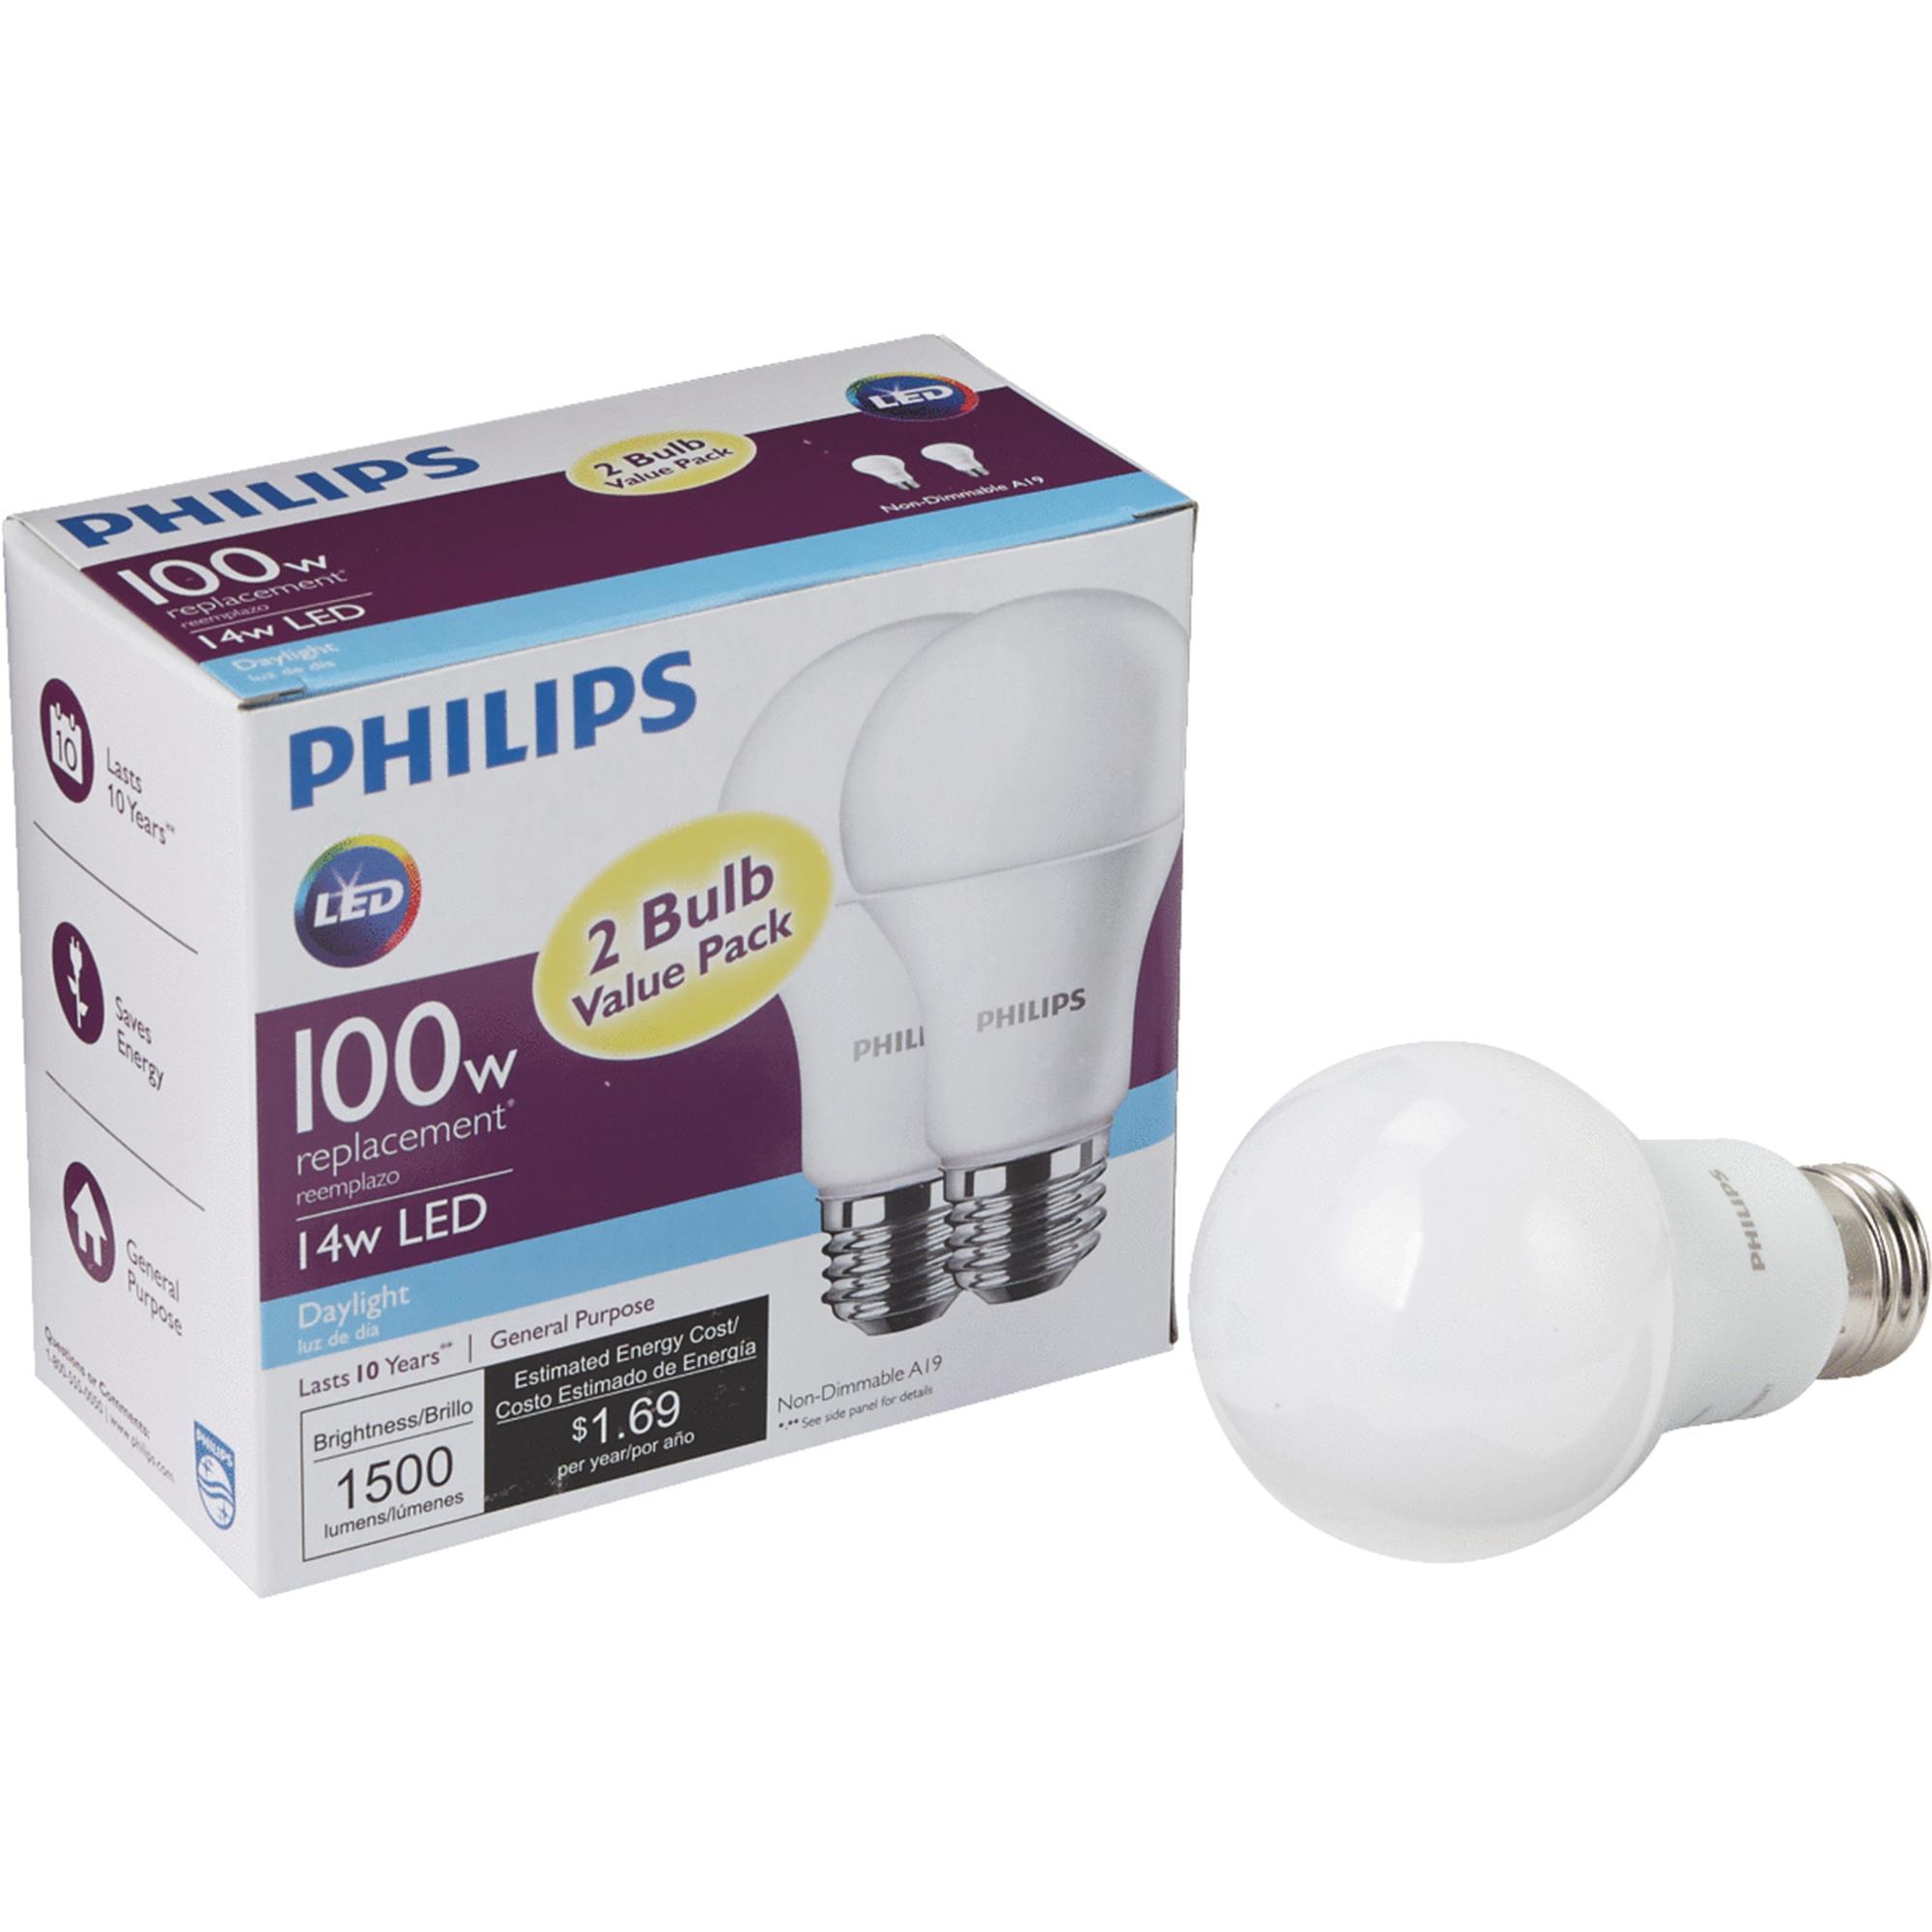 Philips LED 14W (100 Watt Equivalent) Daylight Standard A19 Light Bulb, 2 CT